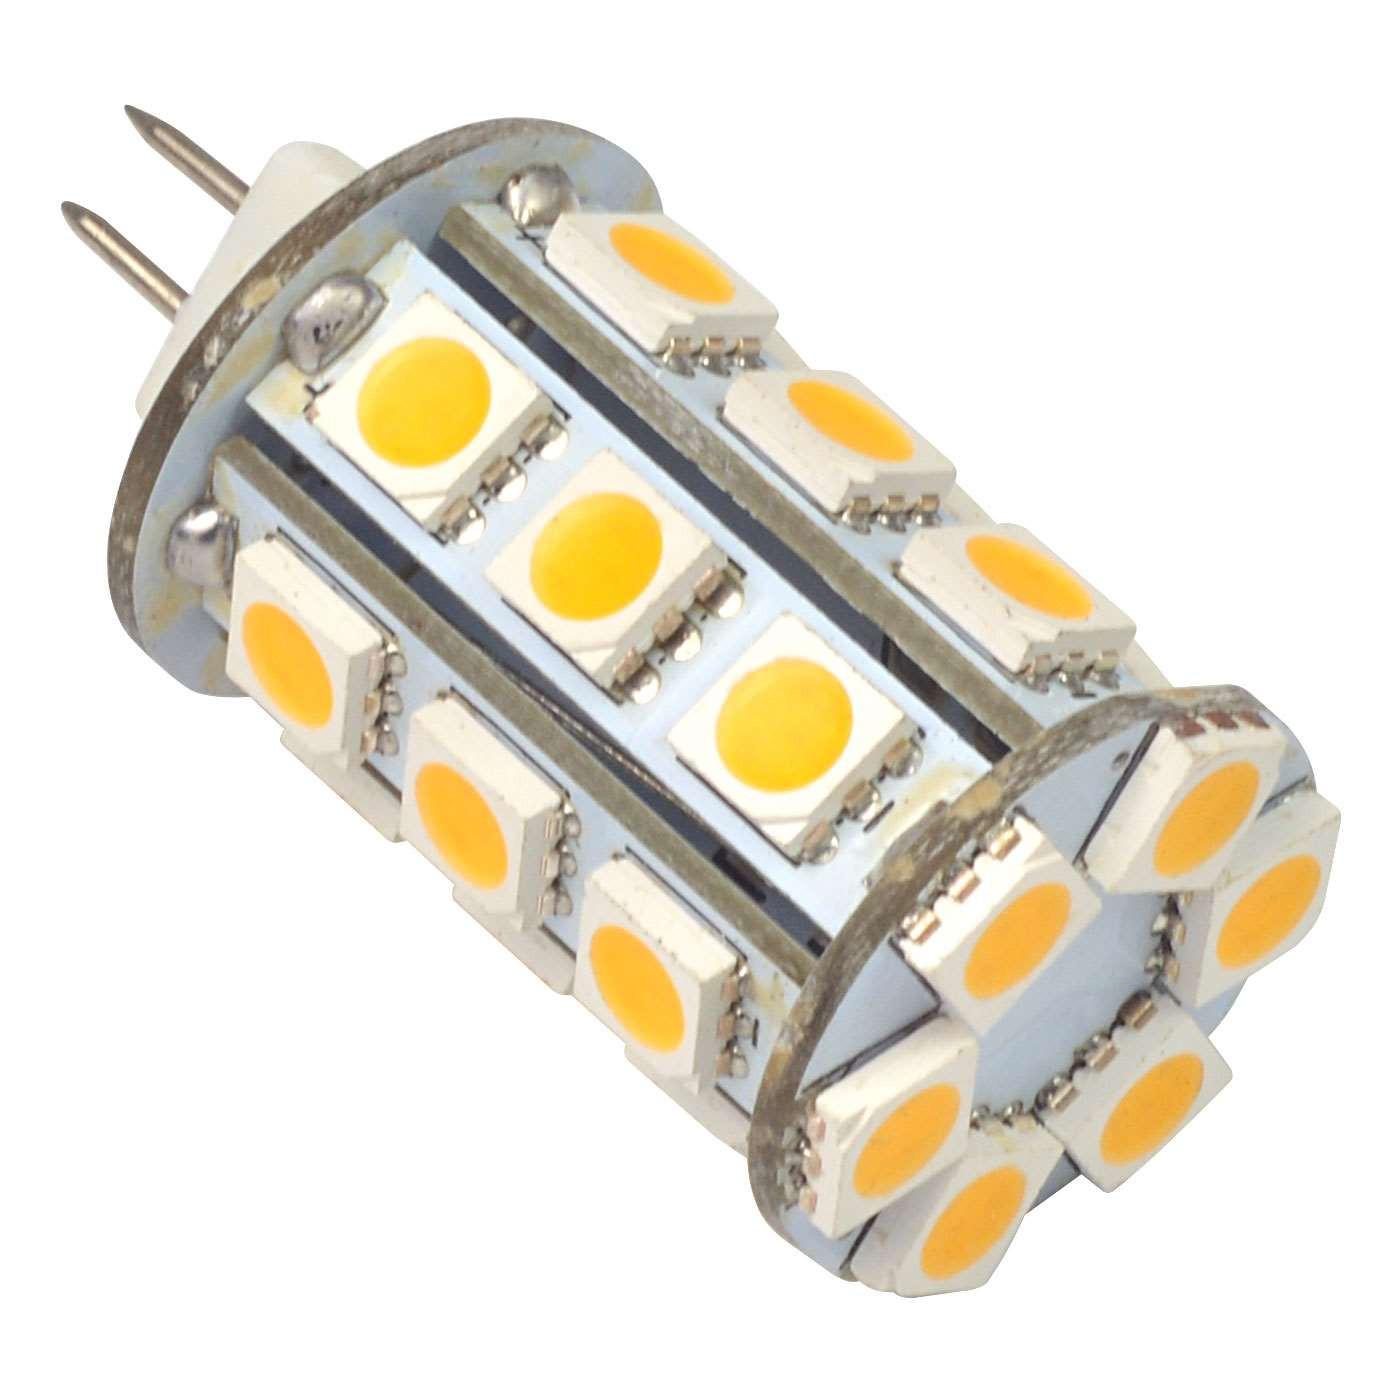 g4 4w led light 24x 5050 smd leds led bulb in warm white energy saving lamp led lights. Black Bedroom Furniture Sets. Home Design Ideas